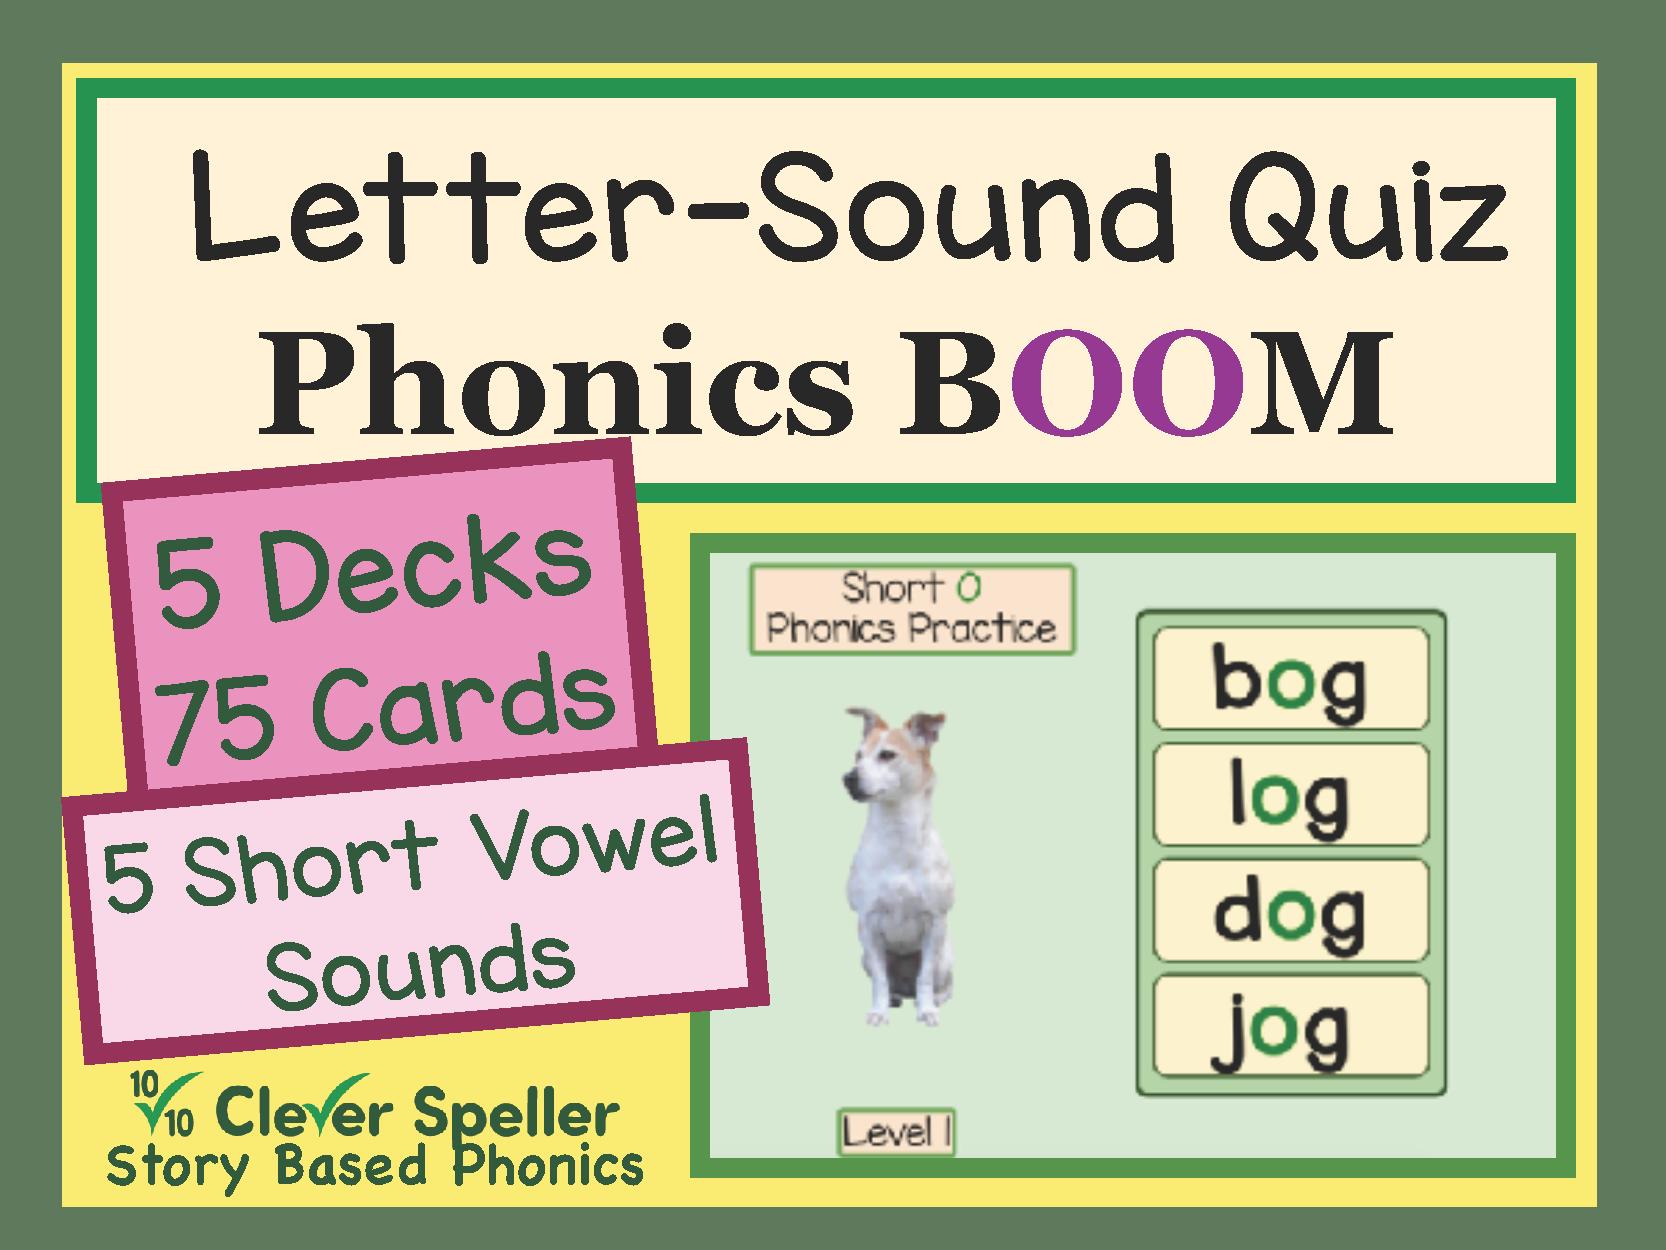 Phonics Practice Boom Cards Short Vowel Sounds Level 1